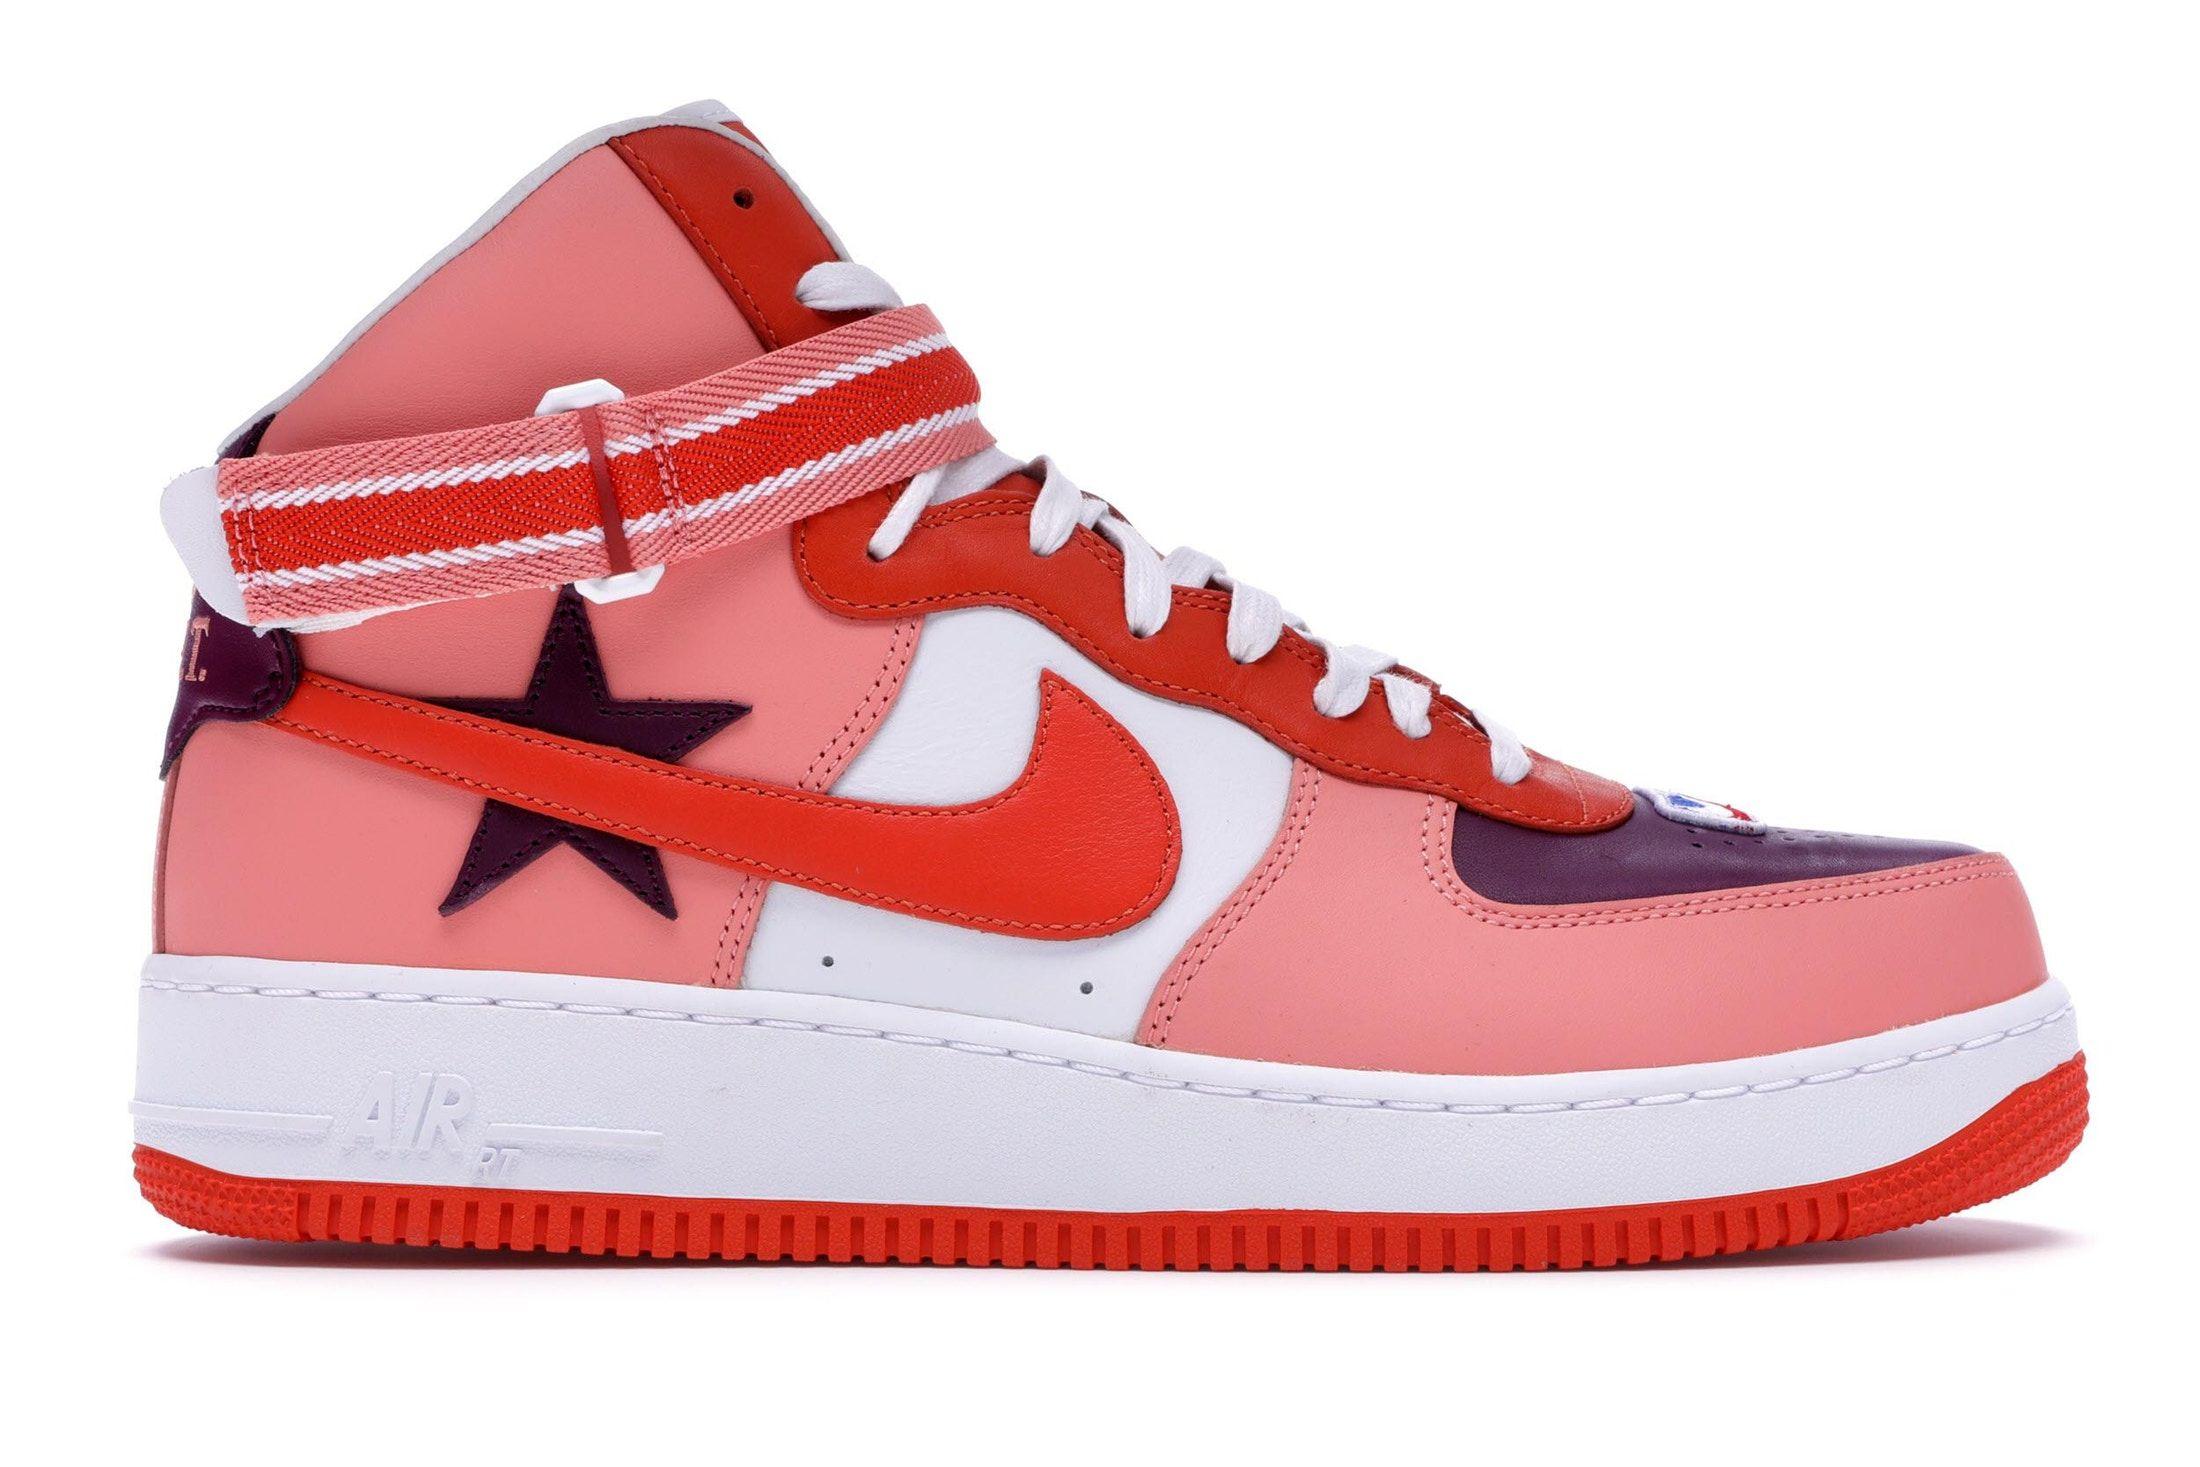 Discurso Dando Fértil  Nike Air Force 1 High Riccardo Tisci All-Star 2018 (Pink) in 2020 | Nike  air force, Air force 1 high, Nike